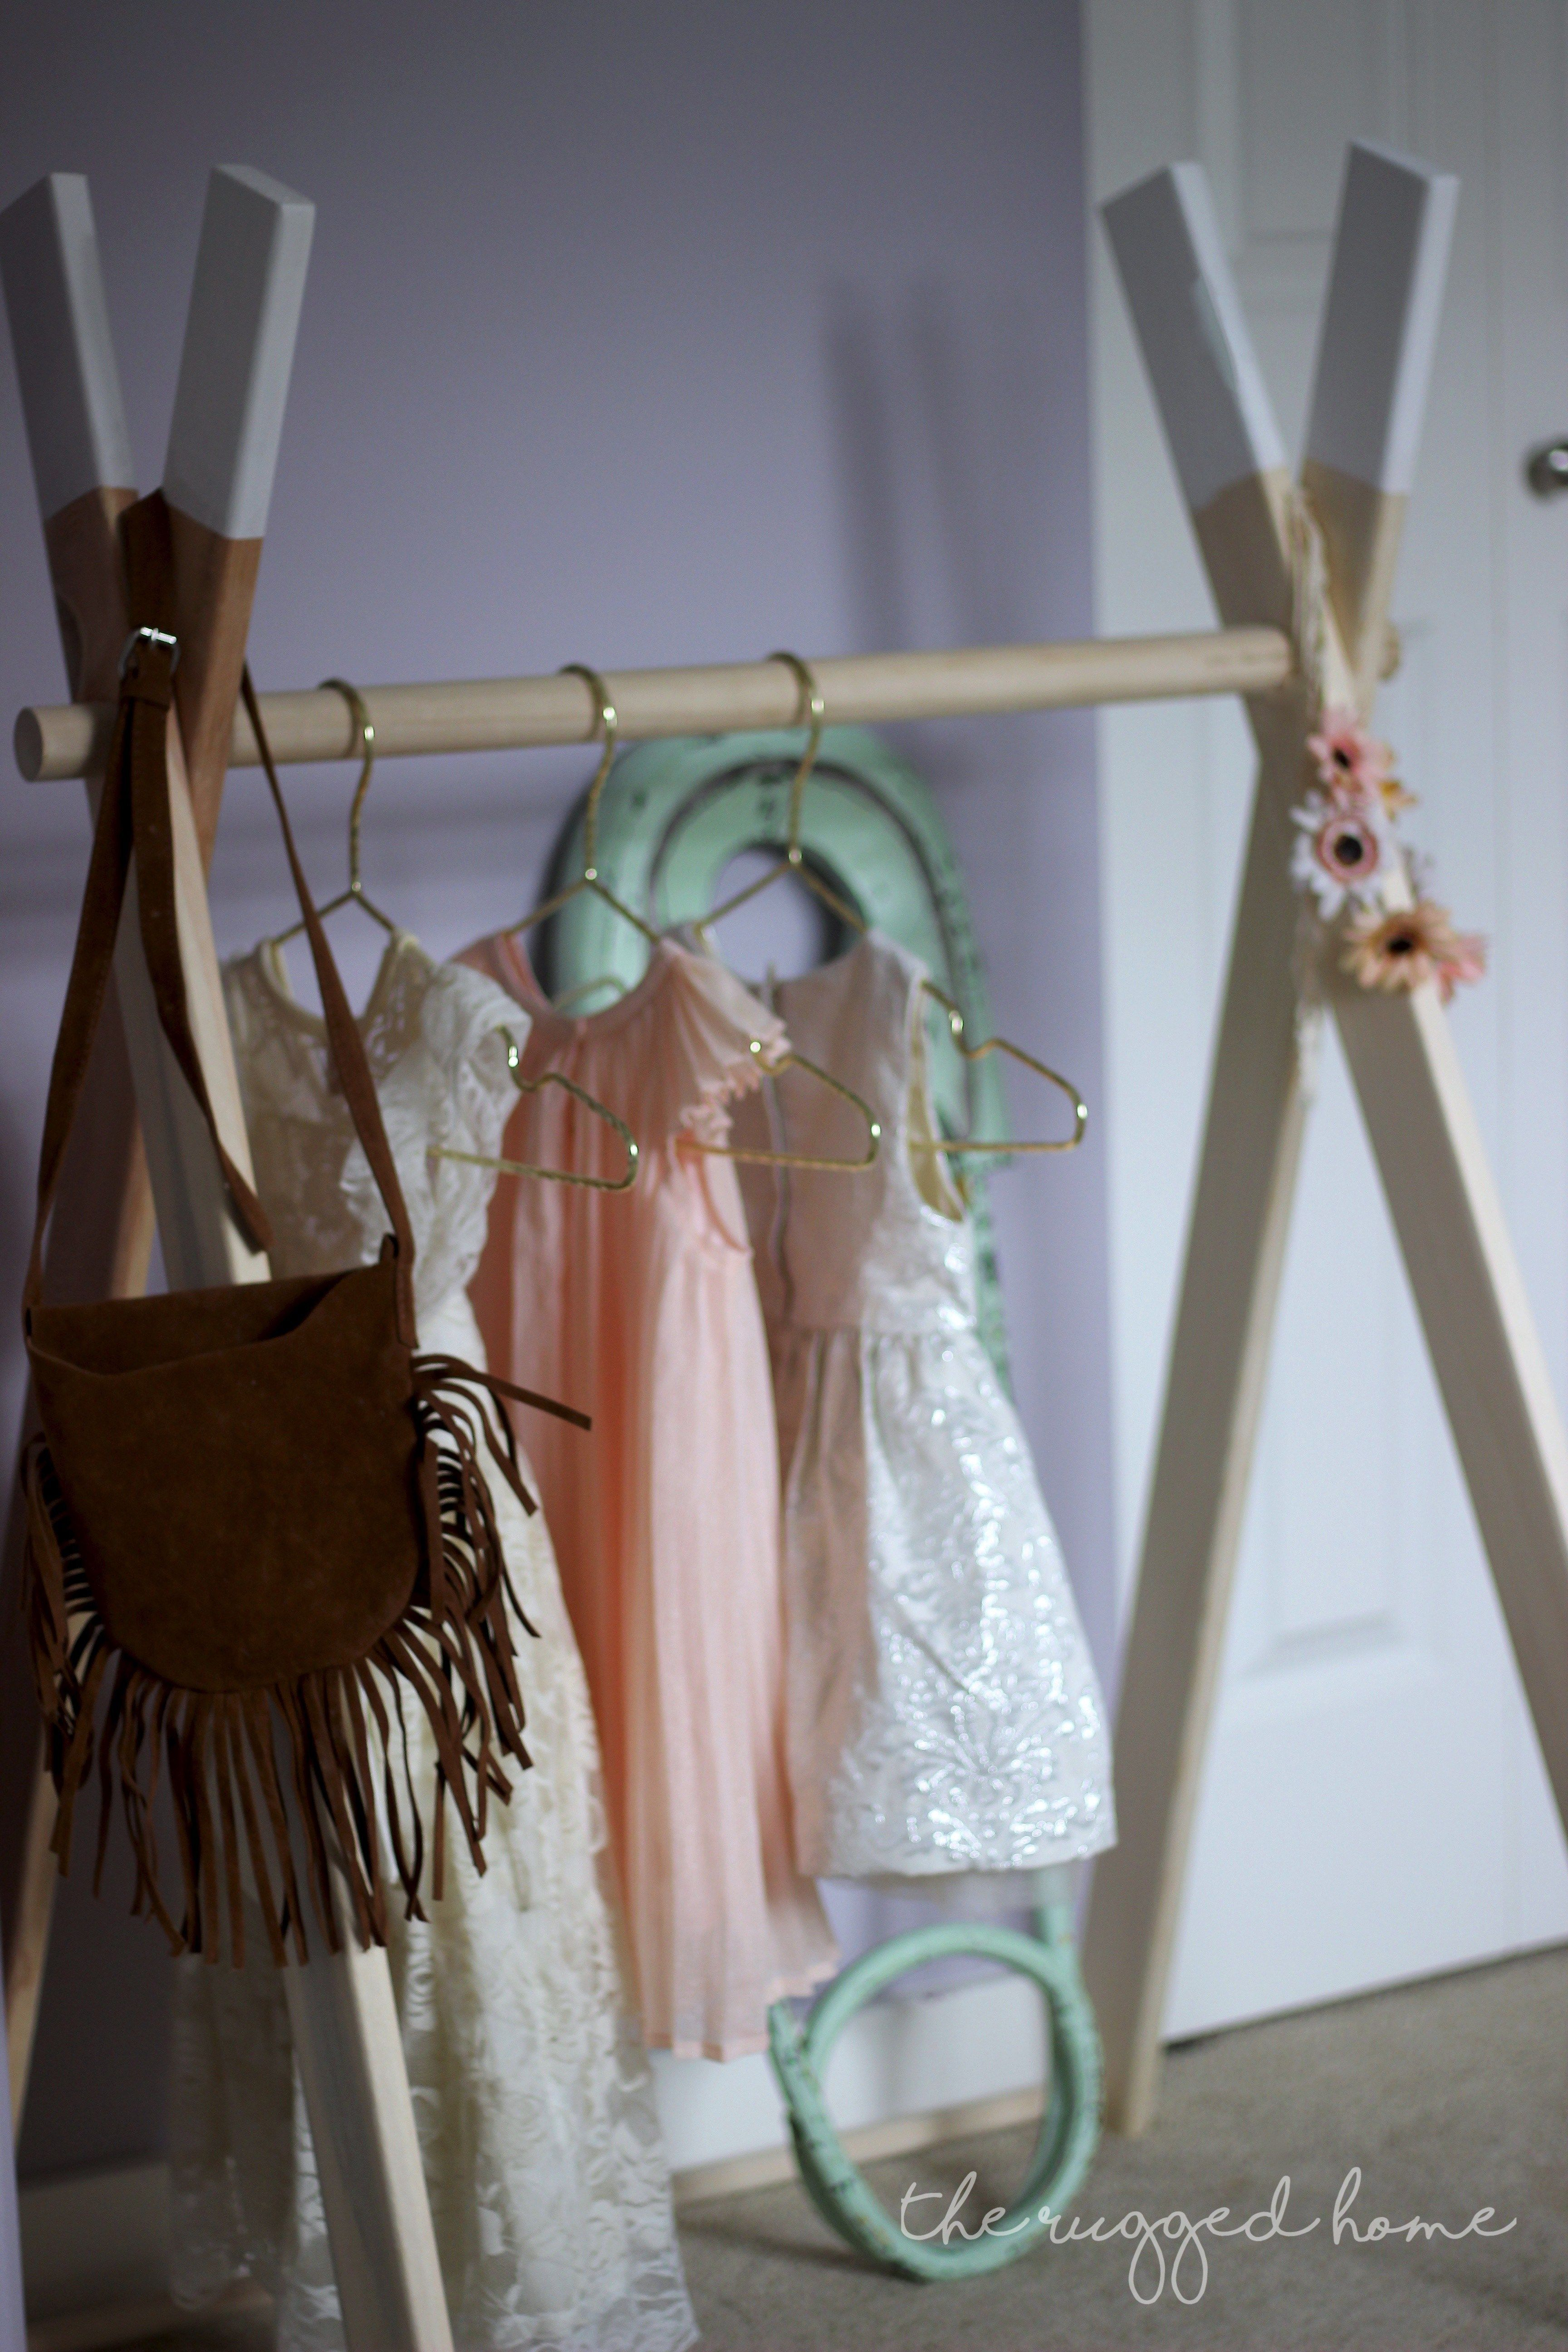 furniture and newest childrens cm storages wardrobes rail hensvik wardrobe white best ikea throughout kids rack accent photos double